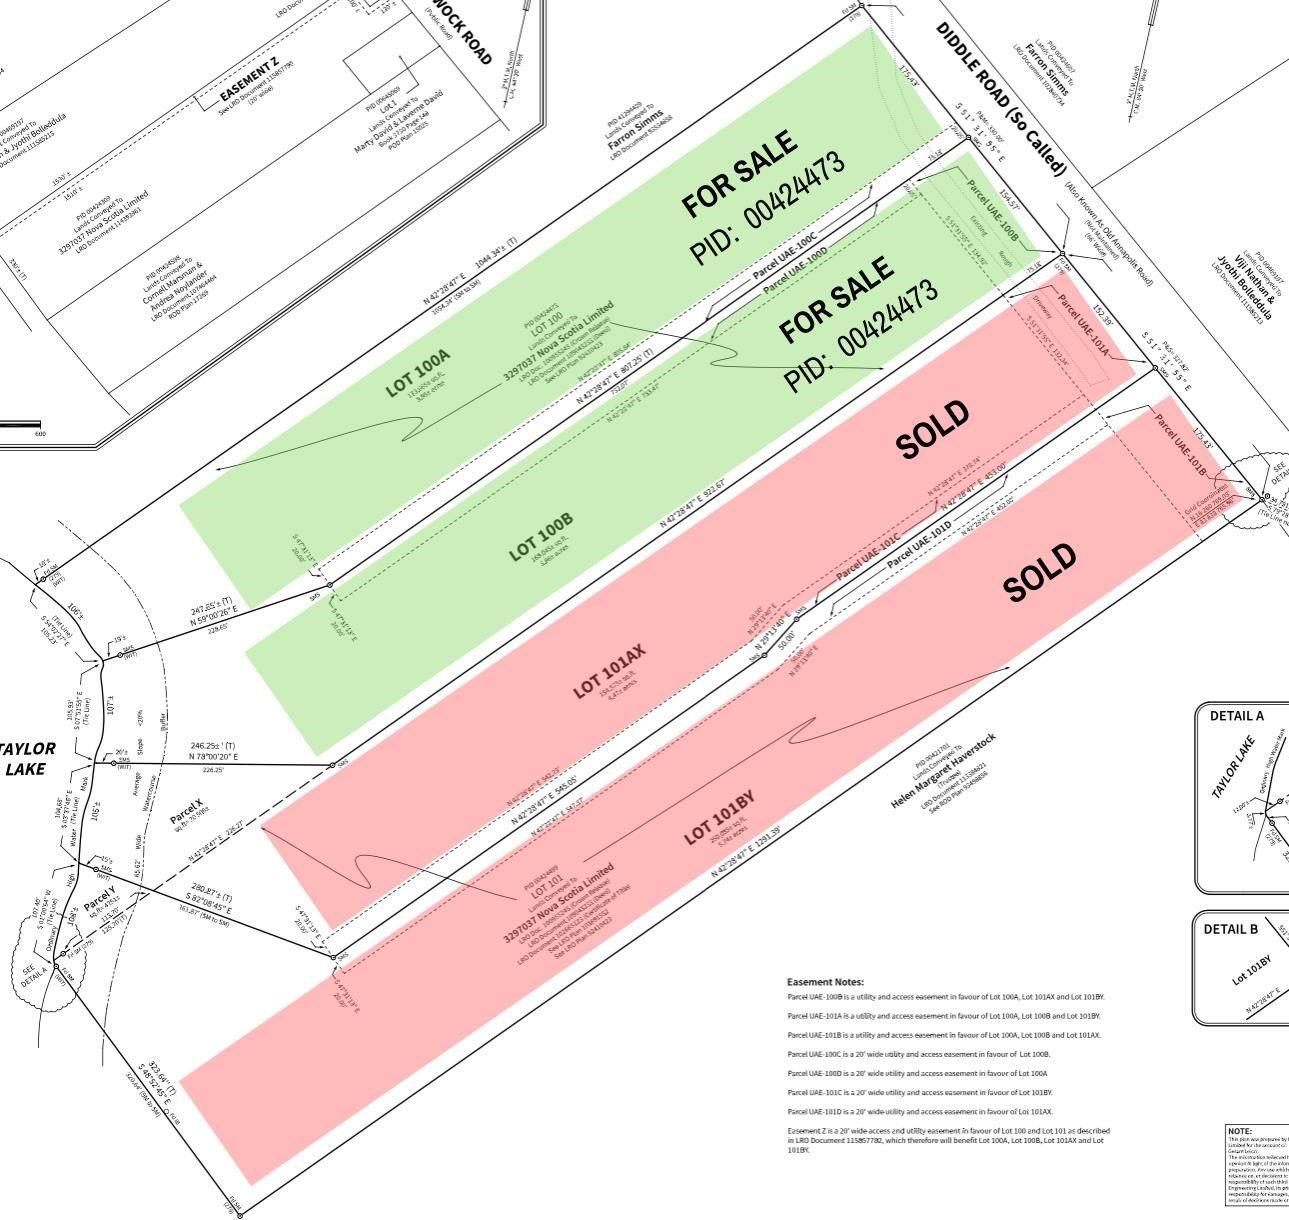 Main Photo: 100A Dockview Lane in Hammonds Plains: 21-Kingswood, Haliburton Hills, Hammonds Pl. Vacant Land for sale (Halifax-Dartmouth)  : MLS®# 202023536